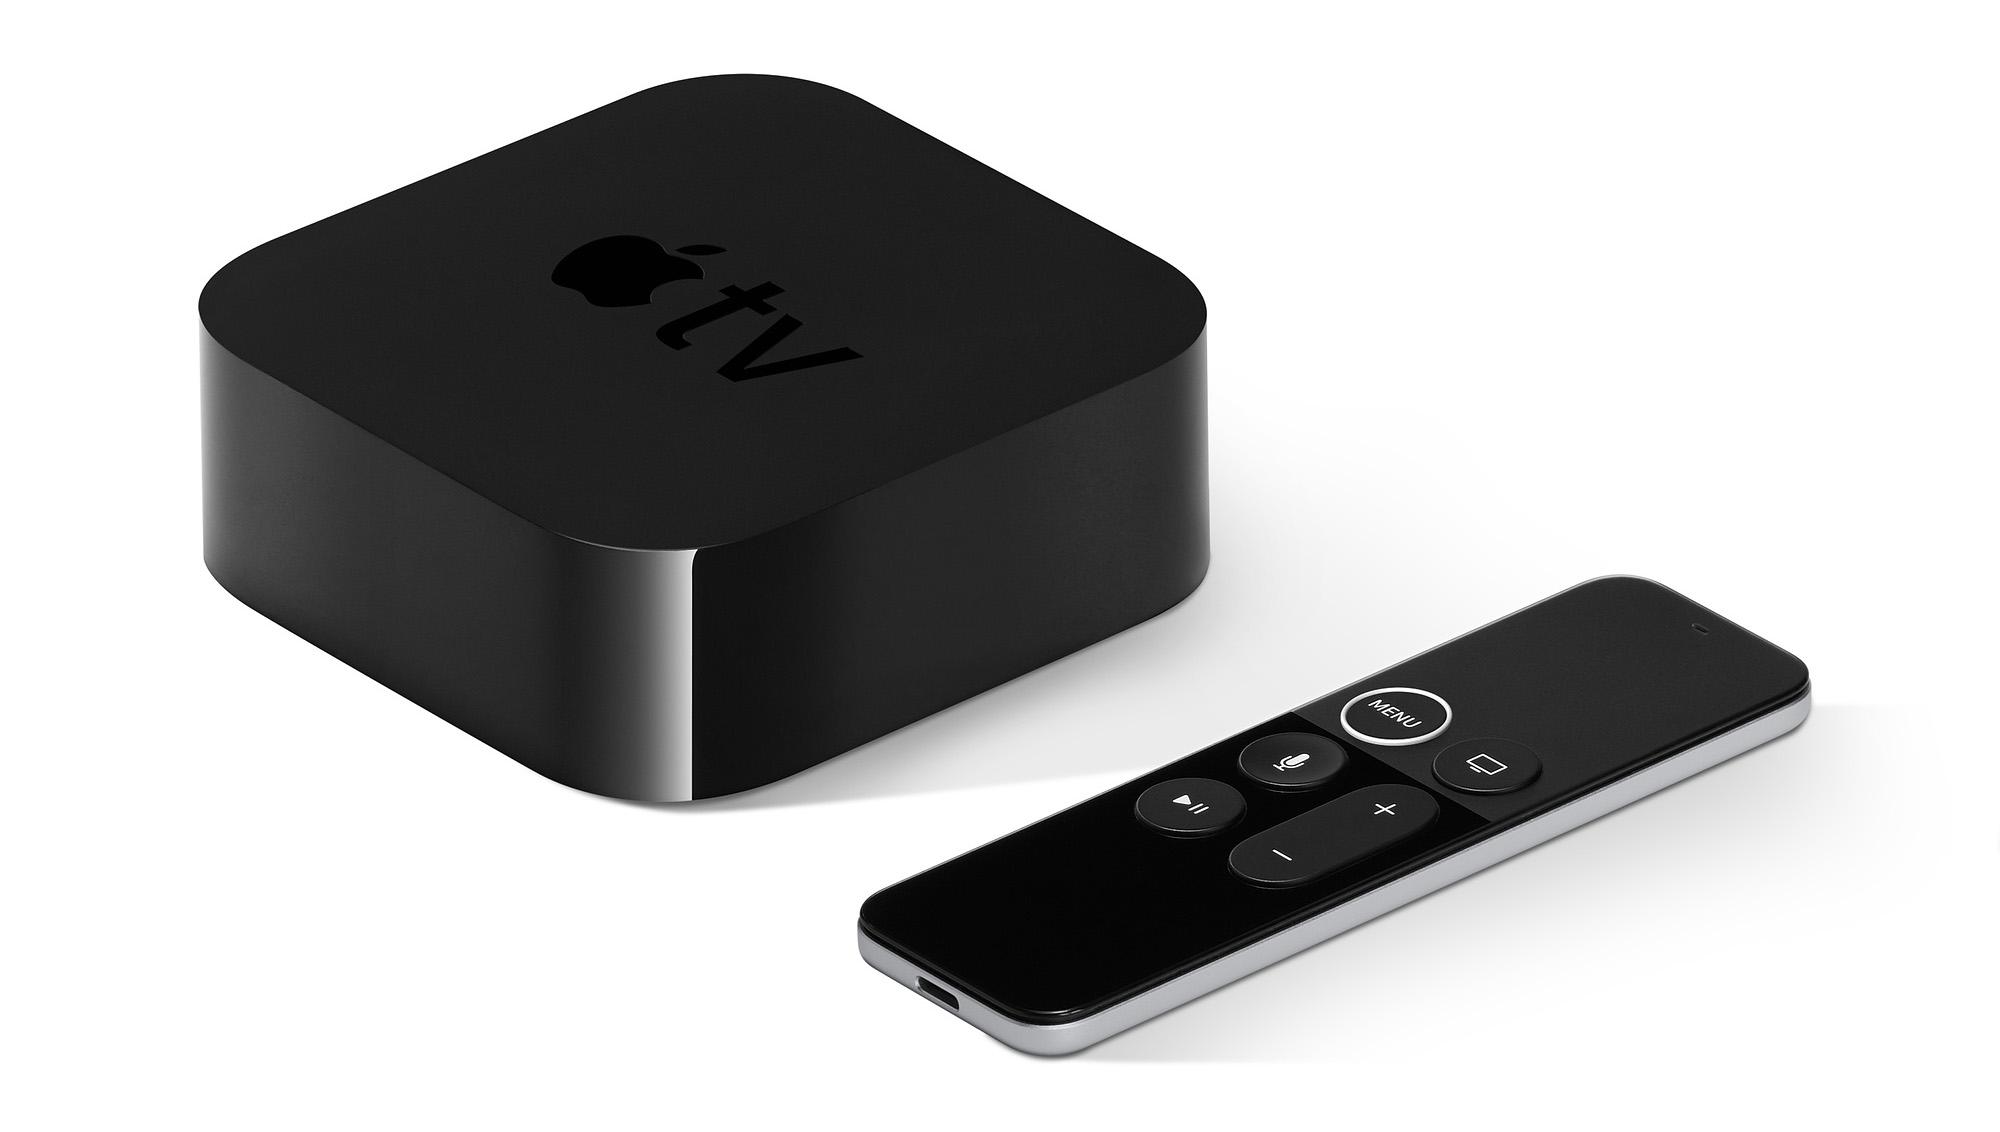 Products like apple tv